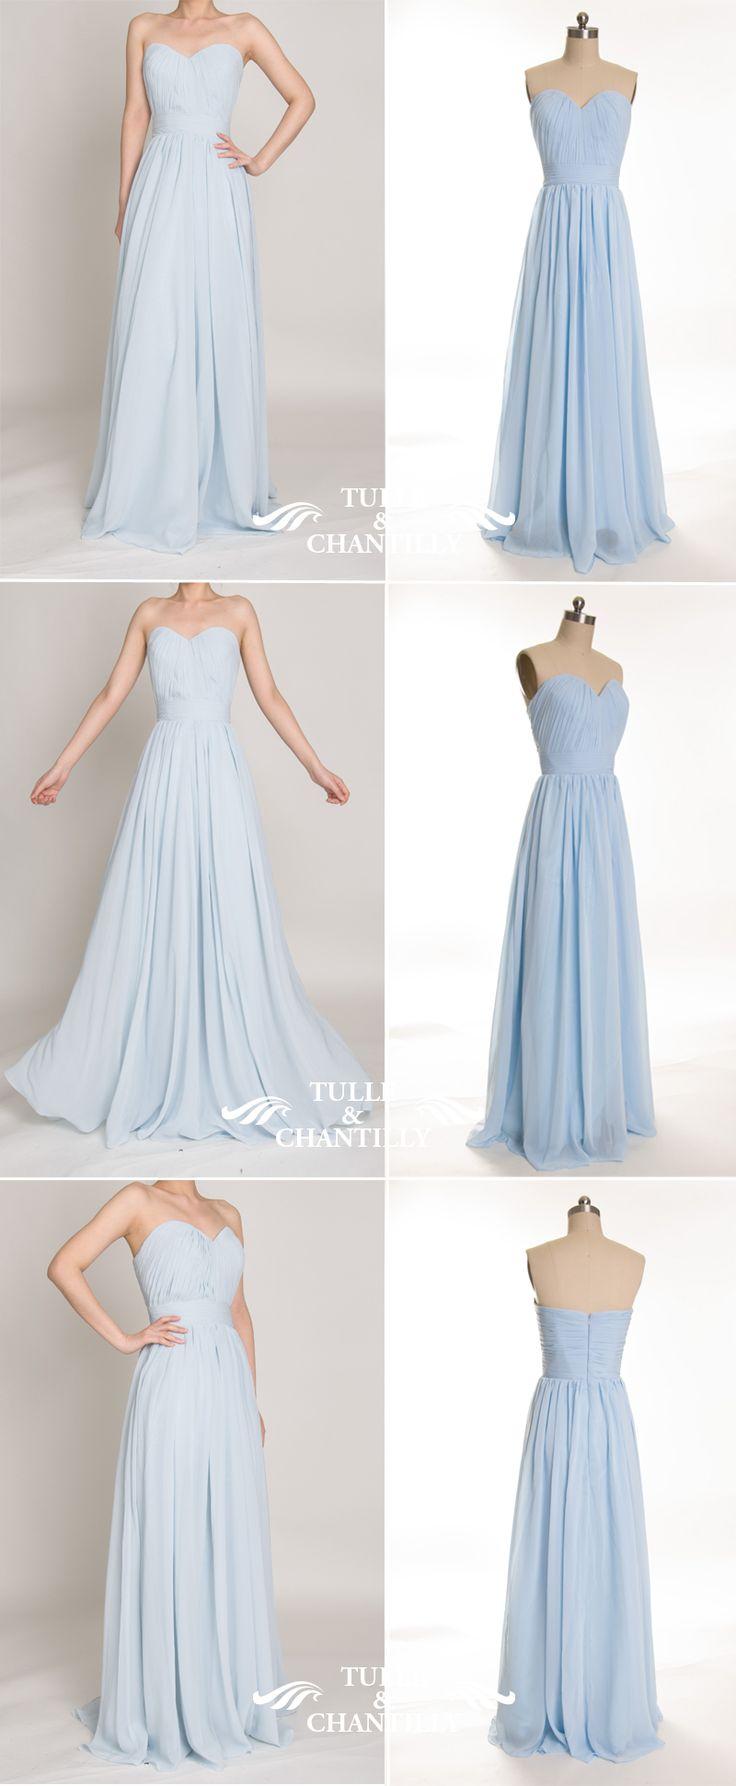 light blue sweetheart chiffon bridesmaid dresses for wedding 2015-2016